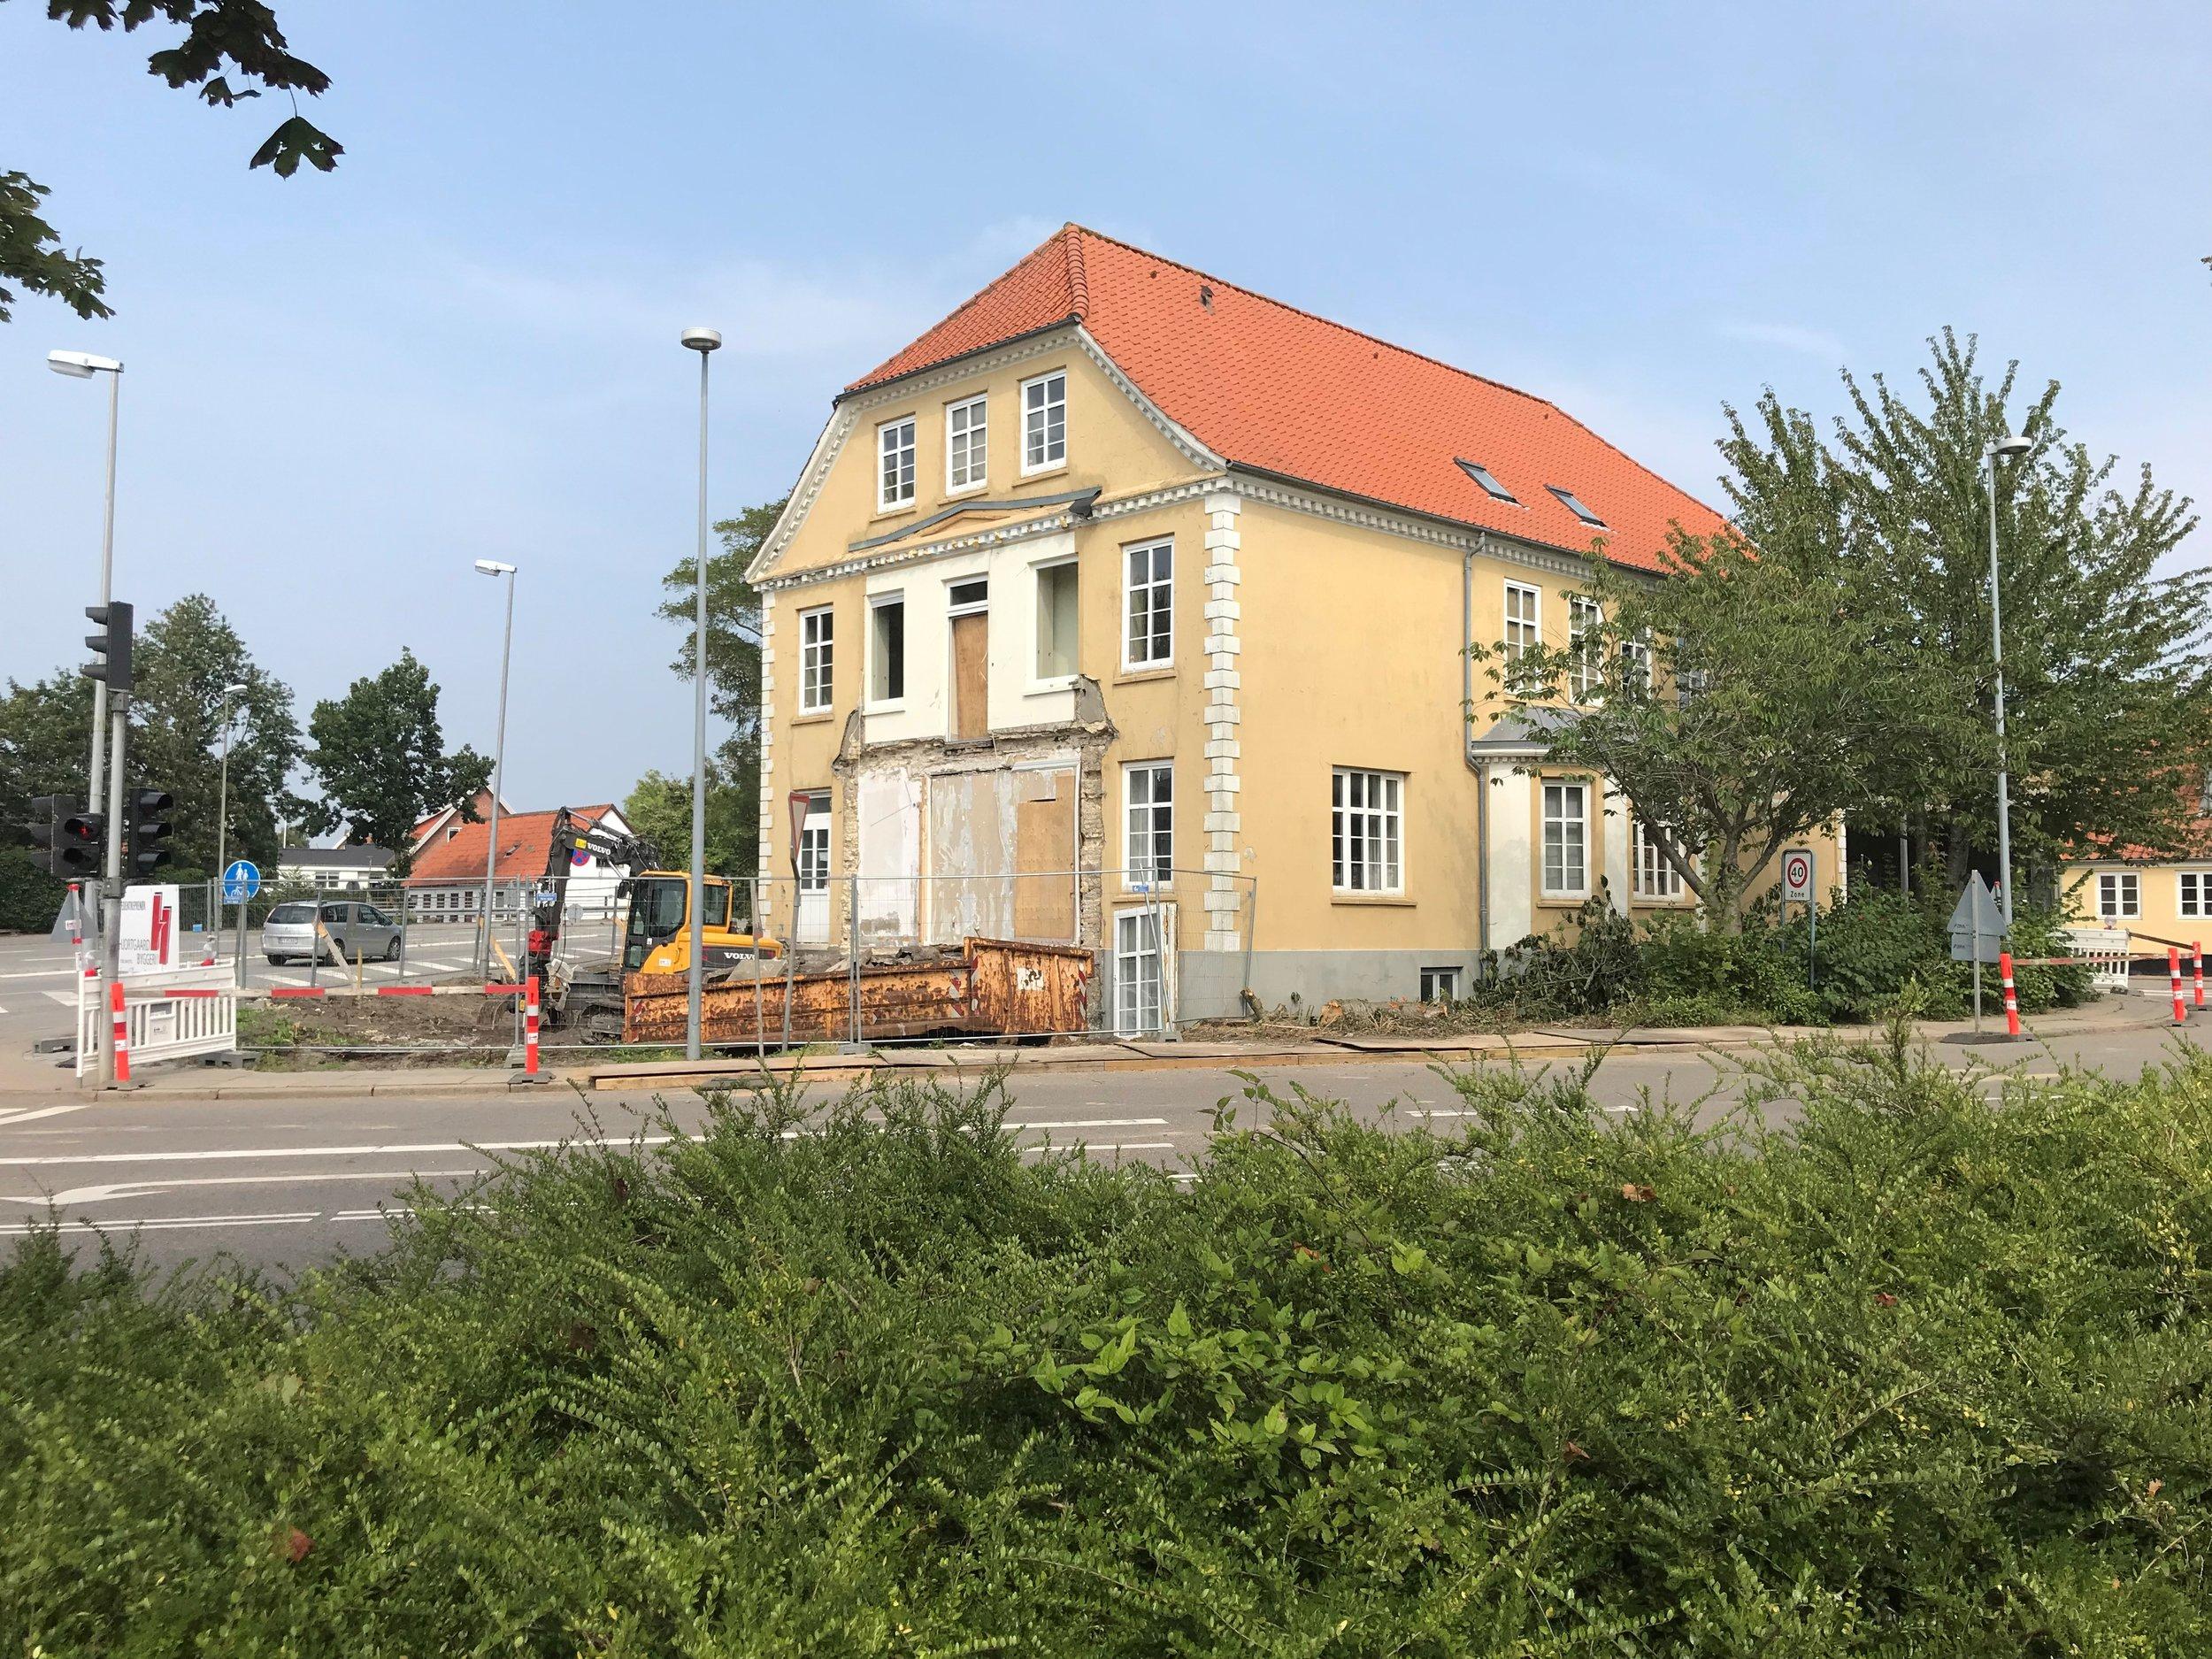 MECO_Architects_Museum-Soenderborg_02.jpg